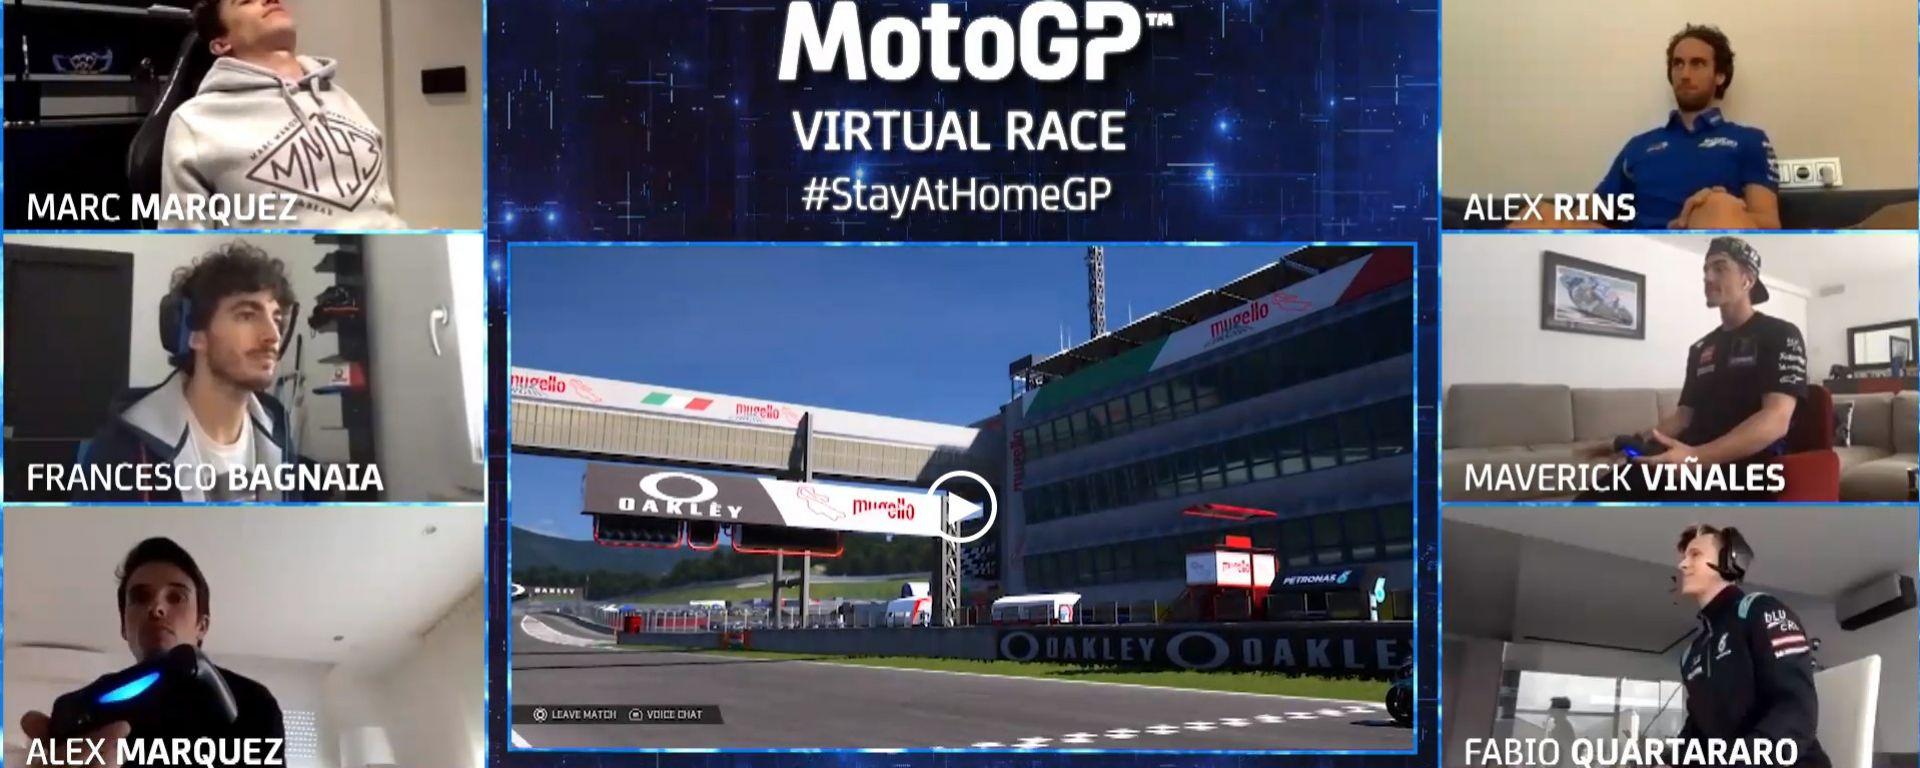 MotoGP StayAtHomeGP Mugello 2020